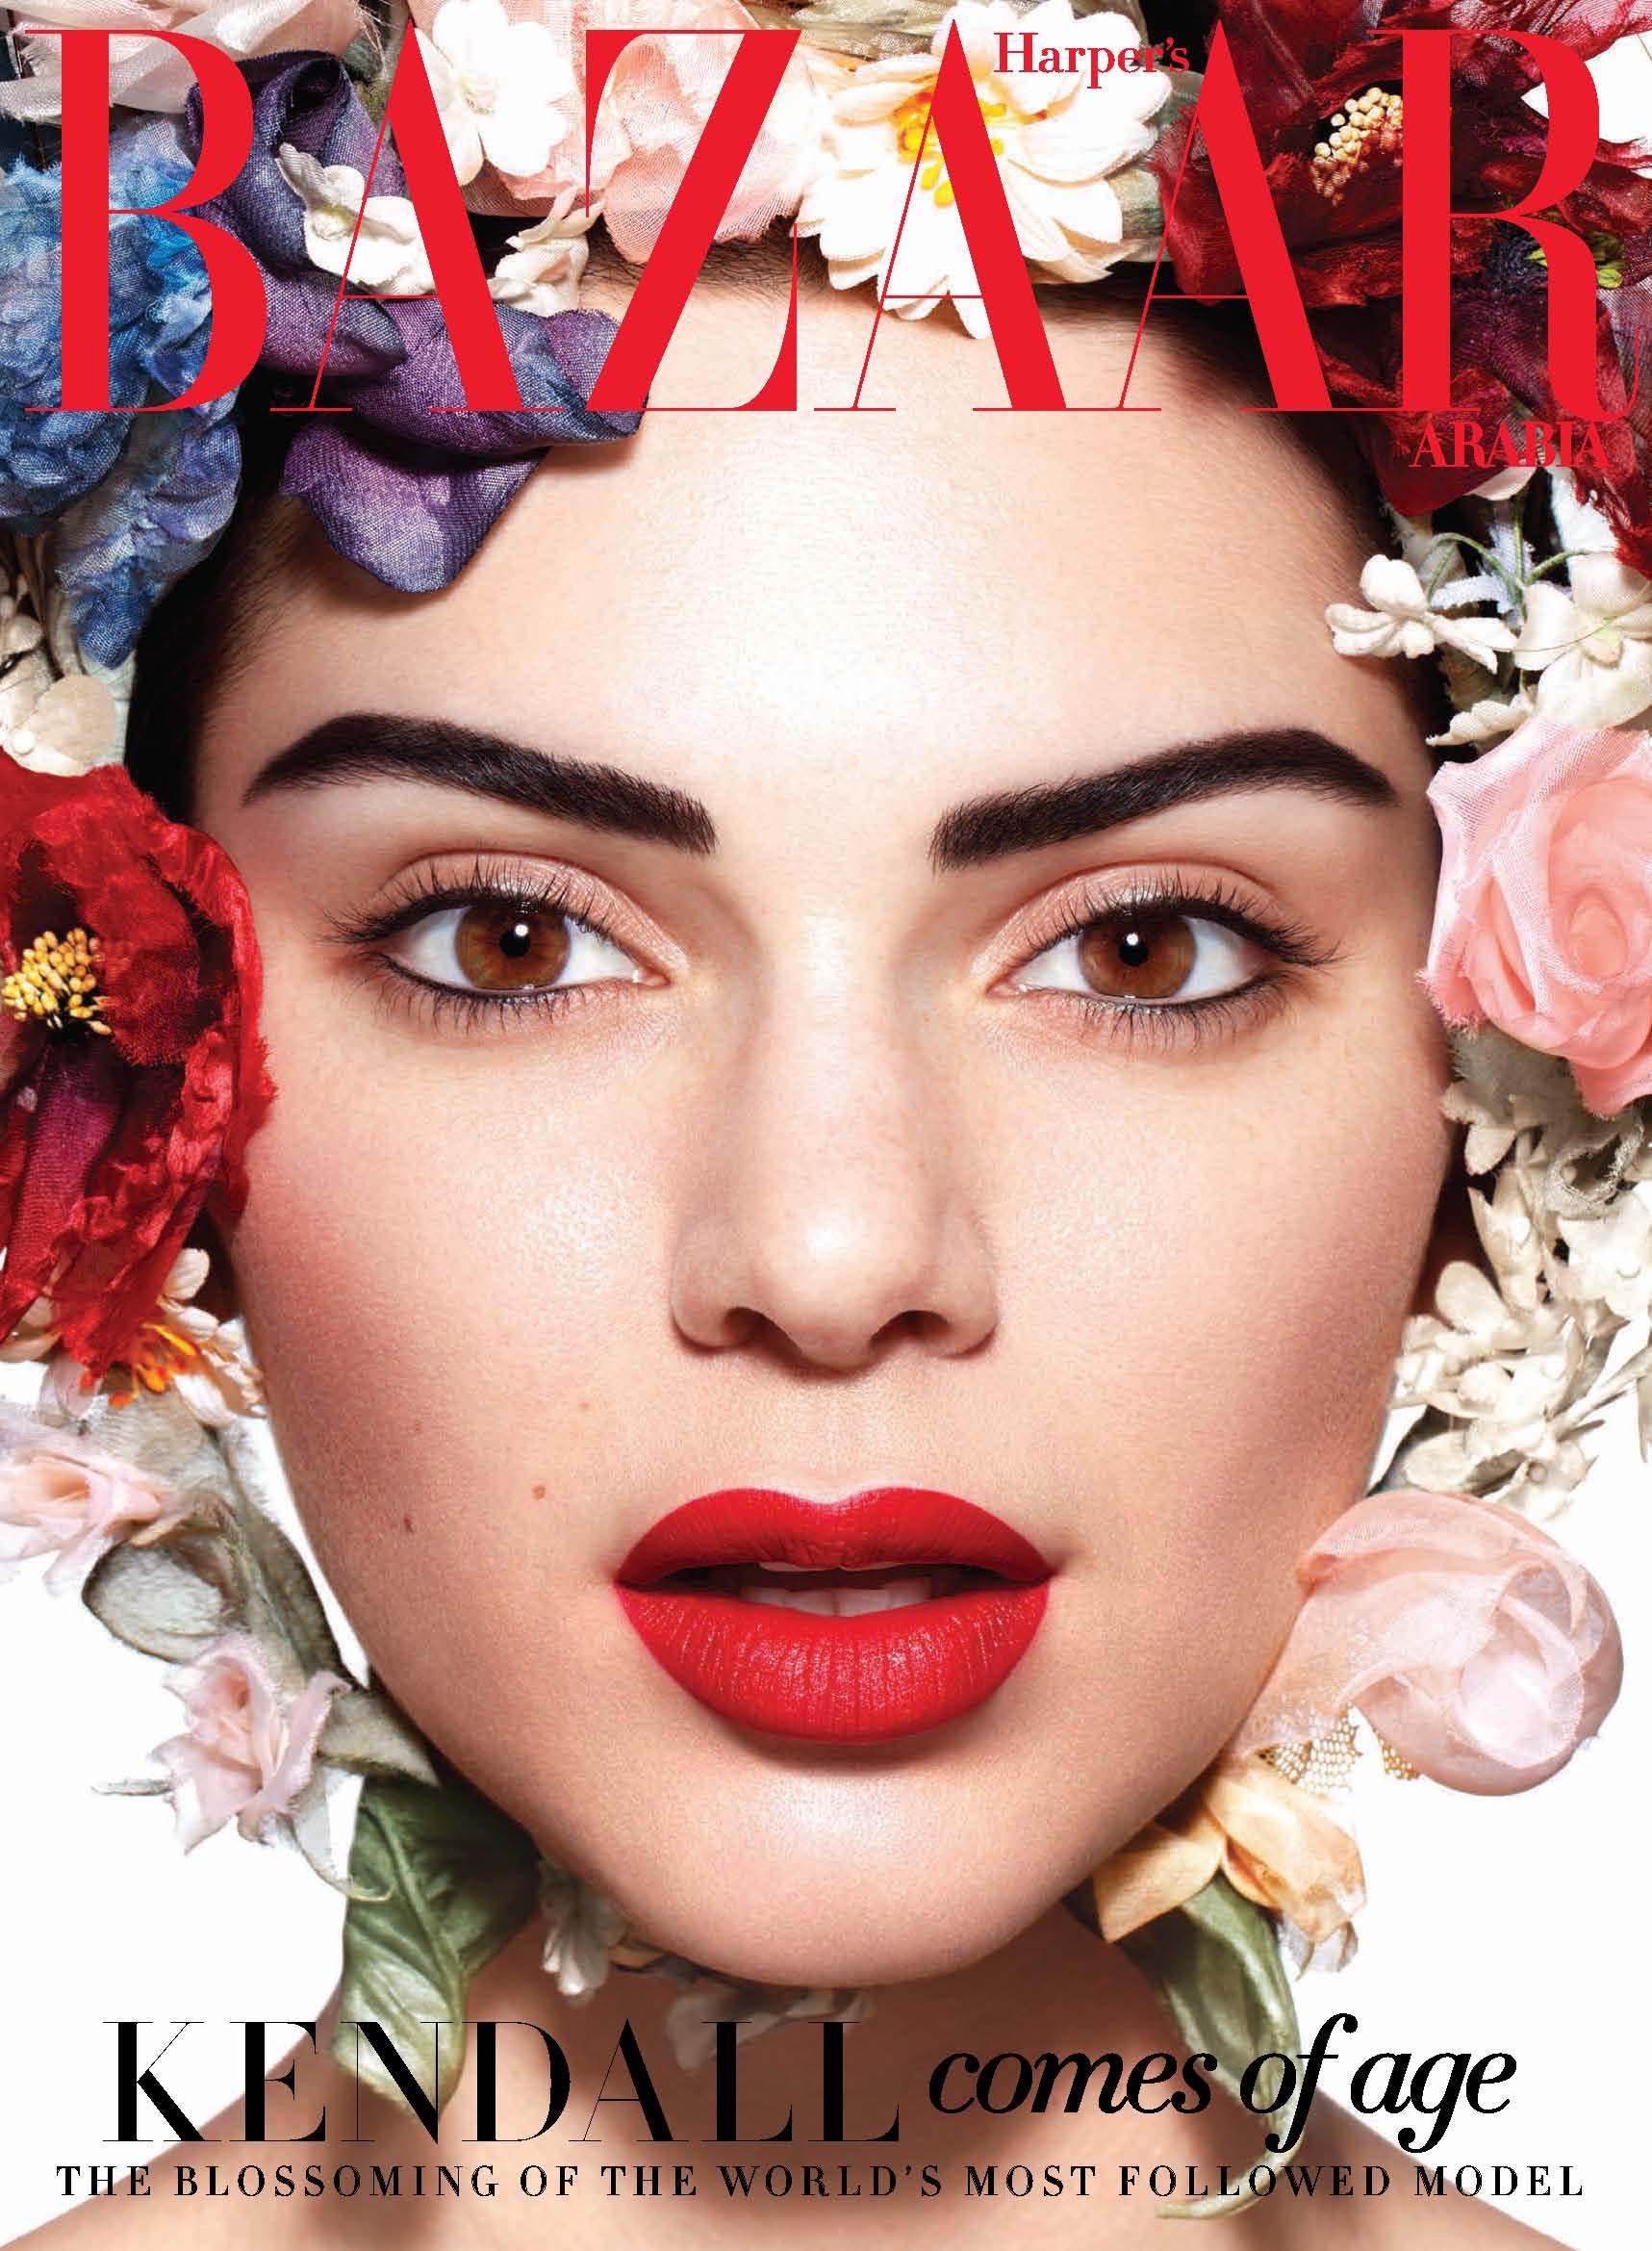 Harper's Bazaar Arabia July/August